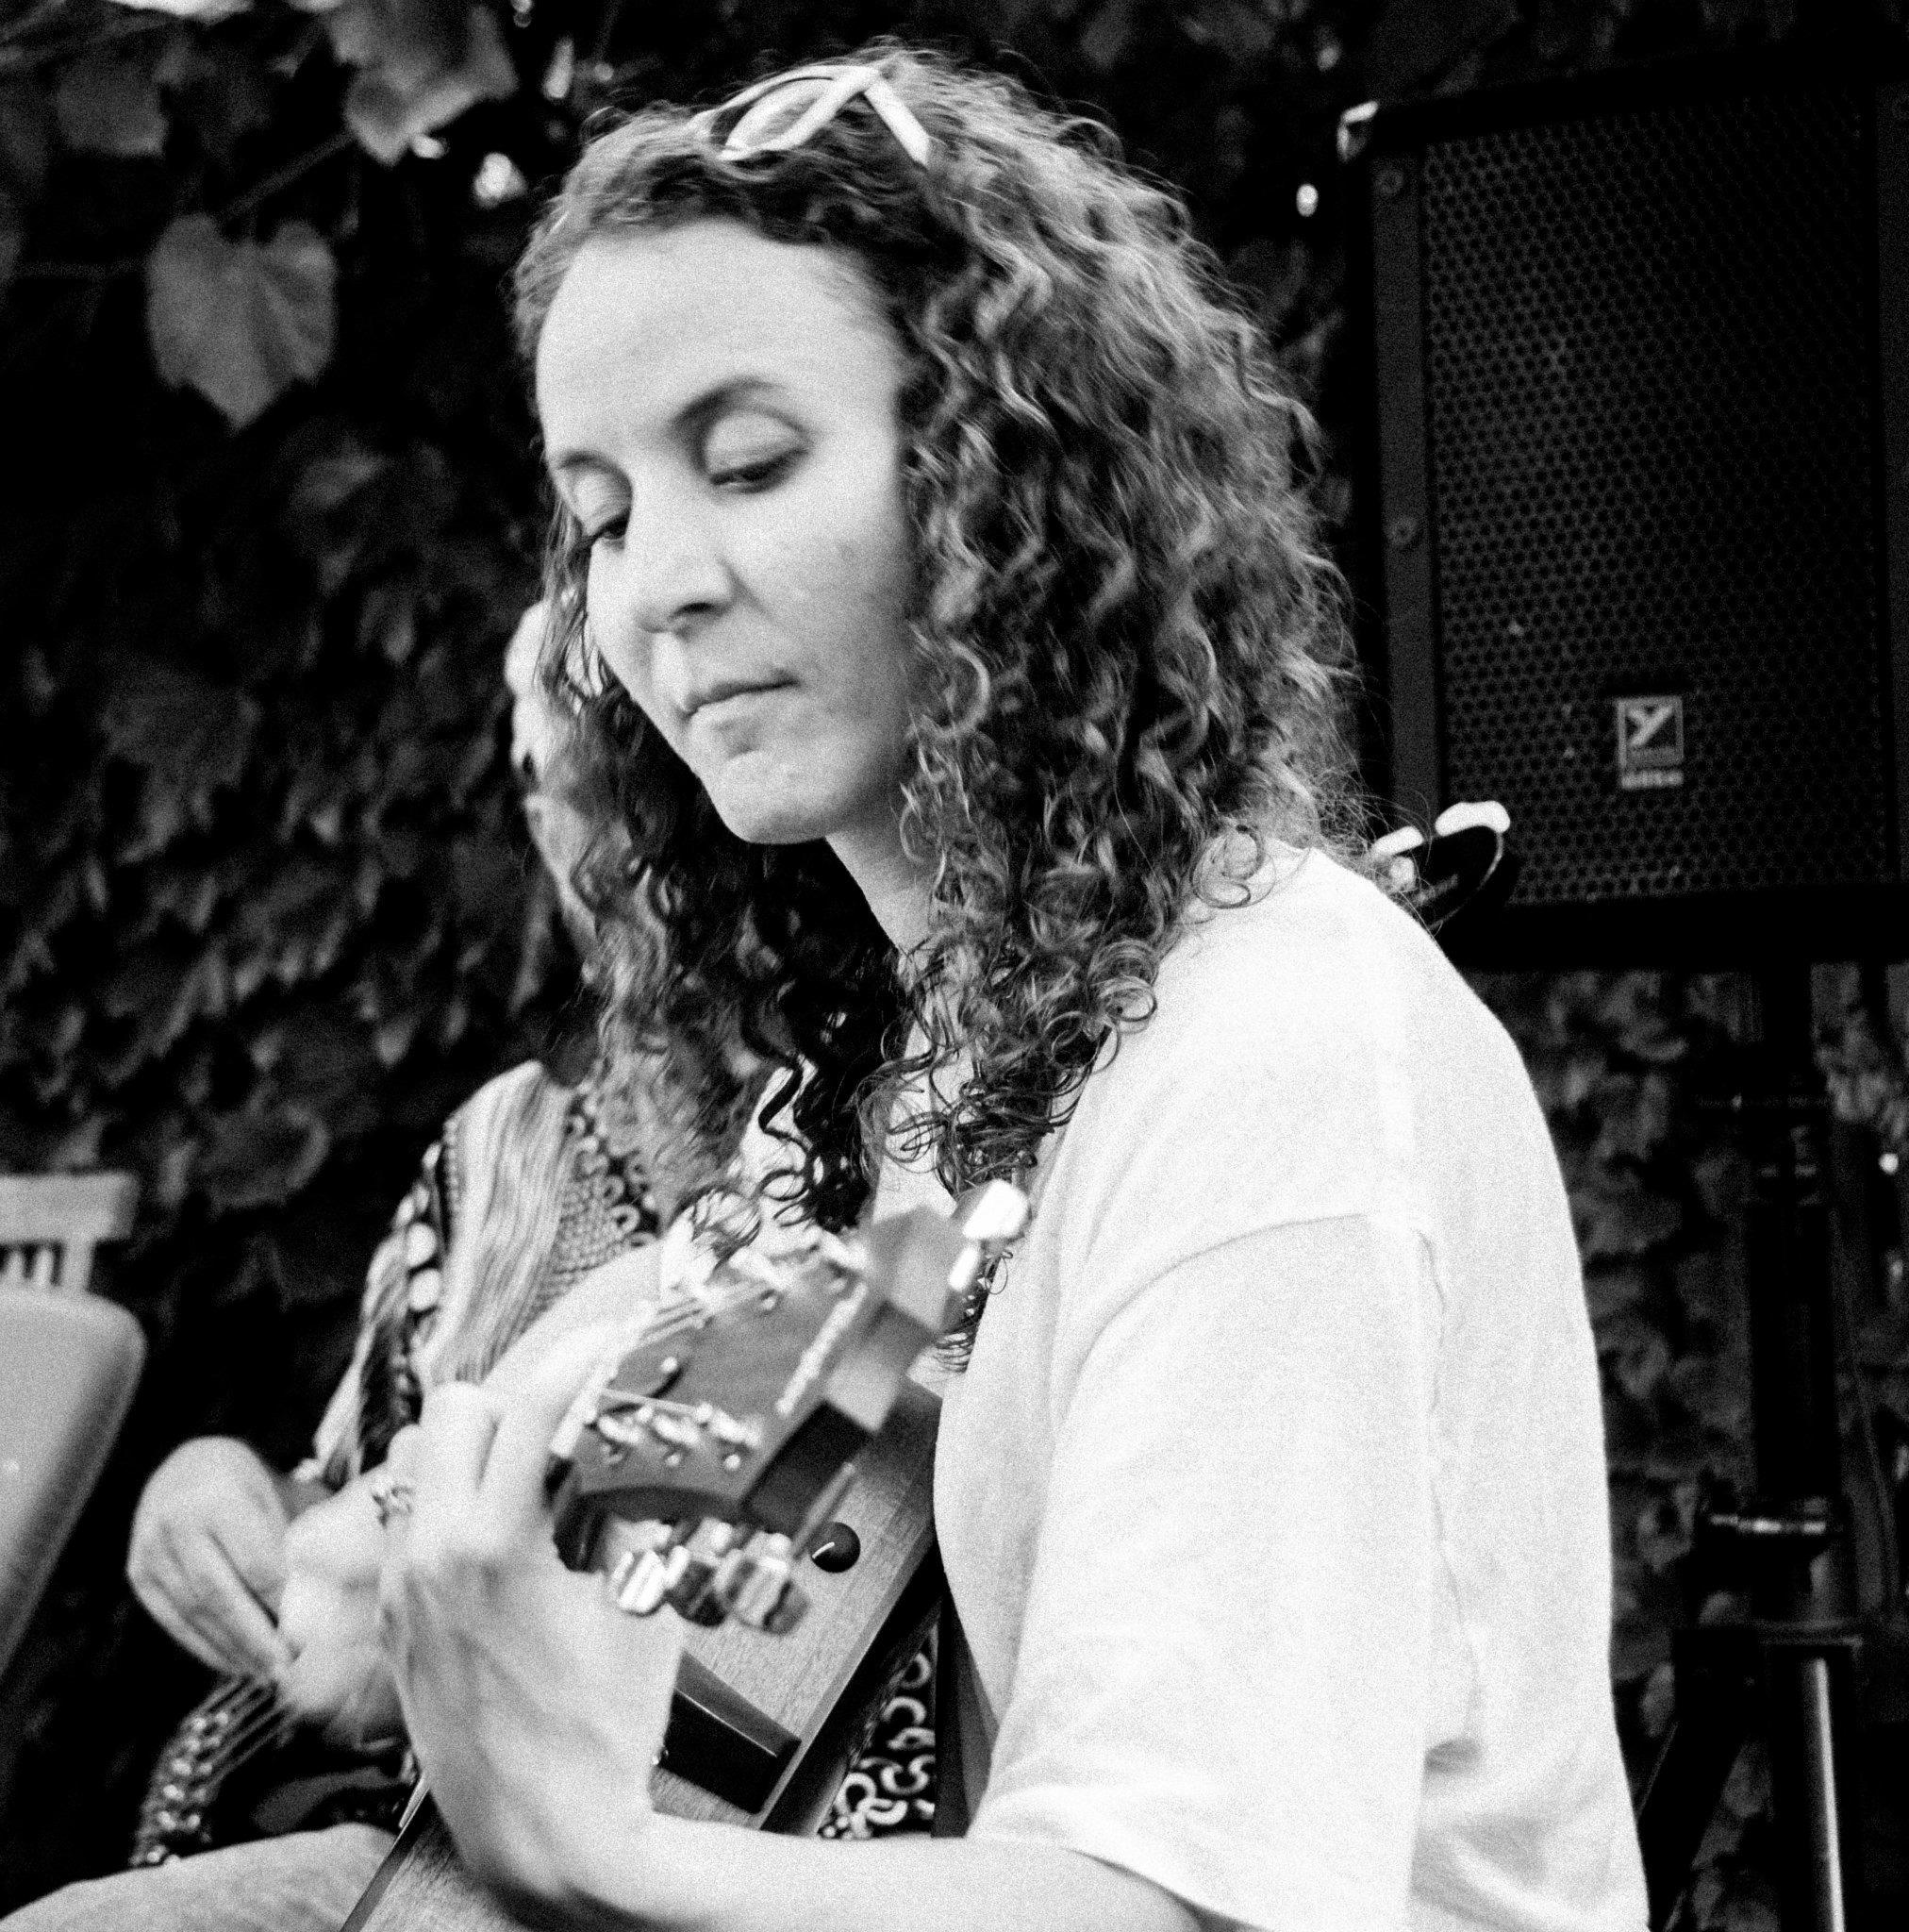 Lori Yates Guitar Pull, Aug, 2013